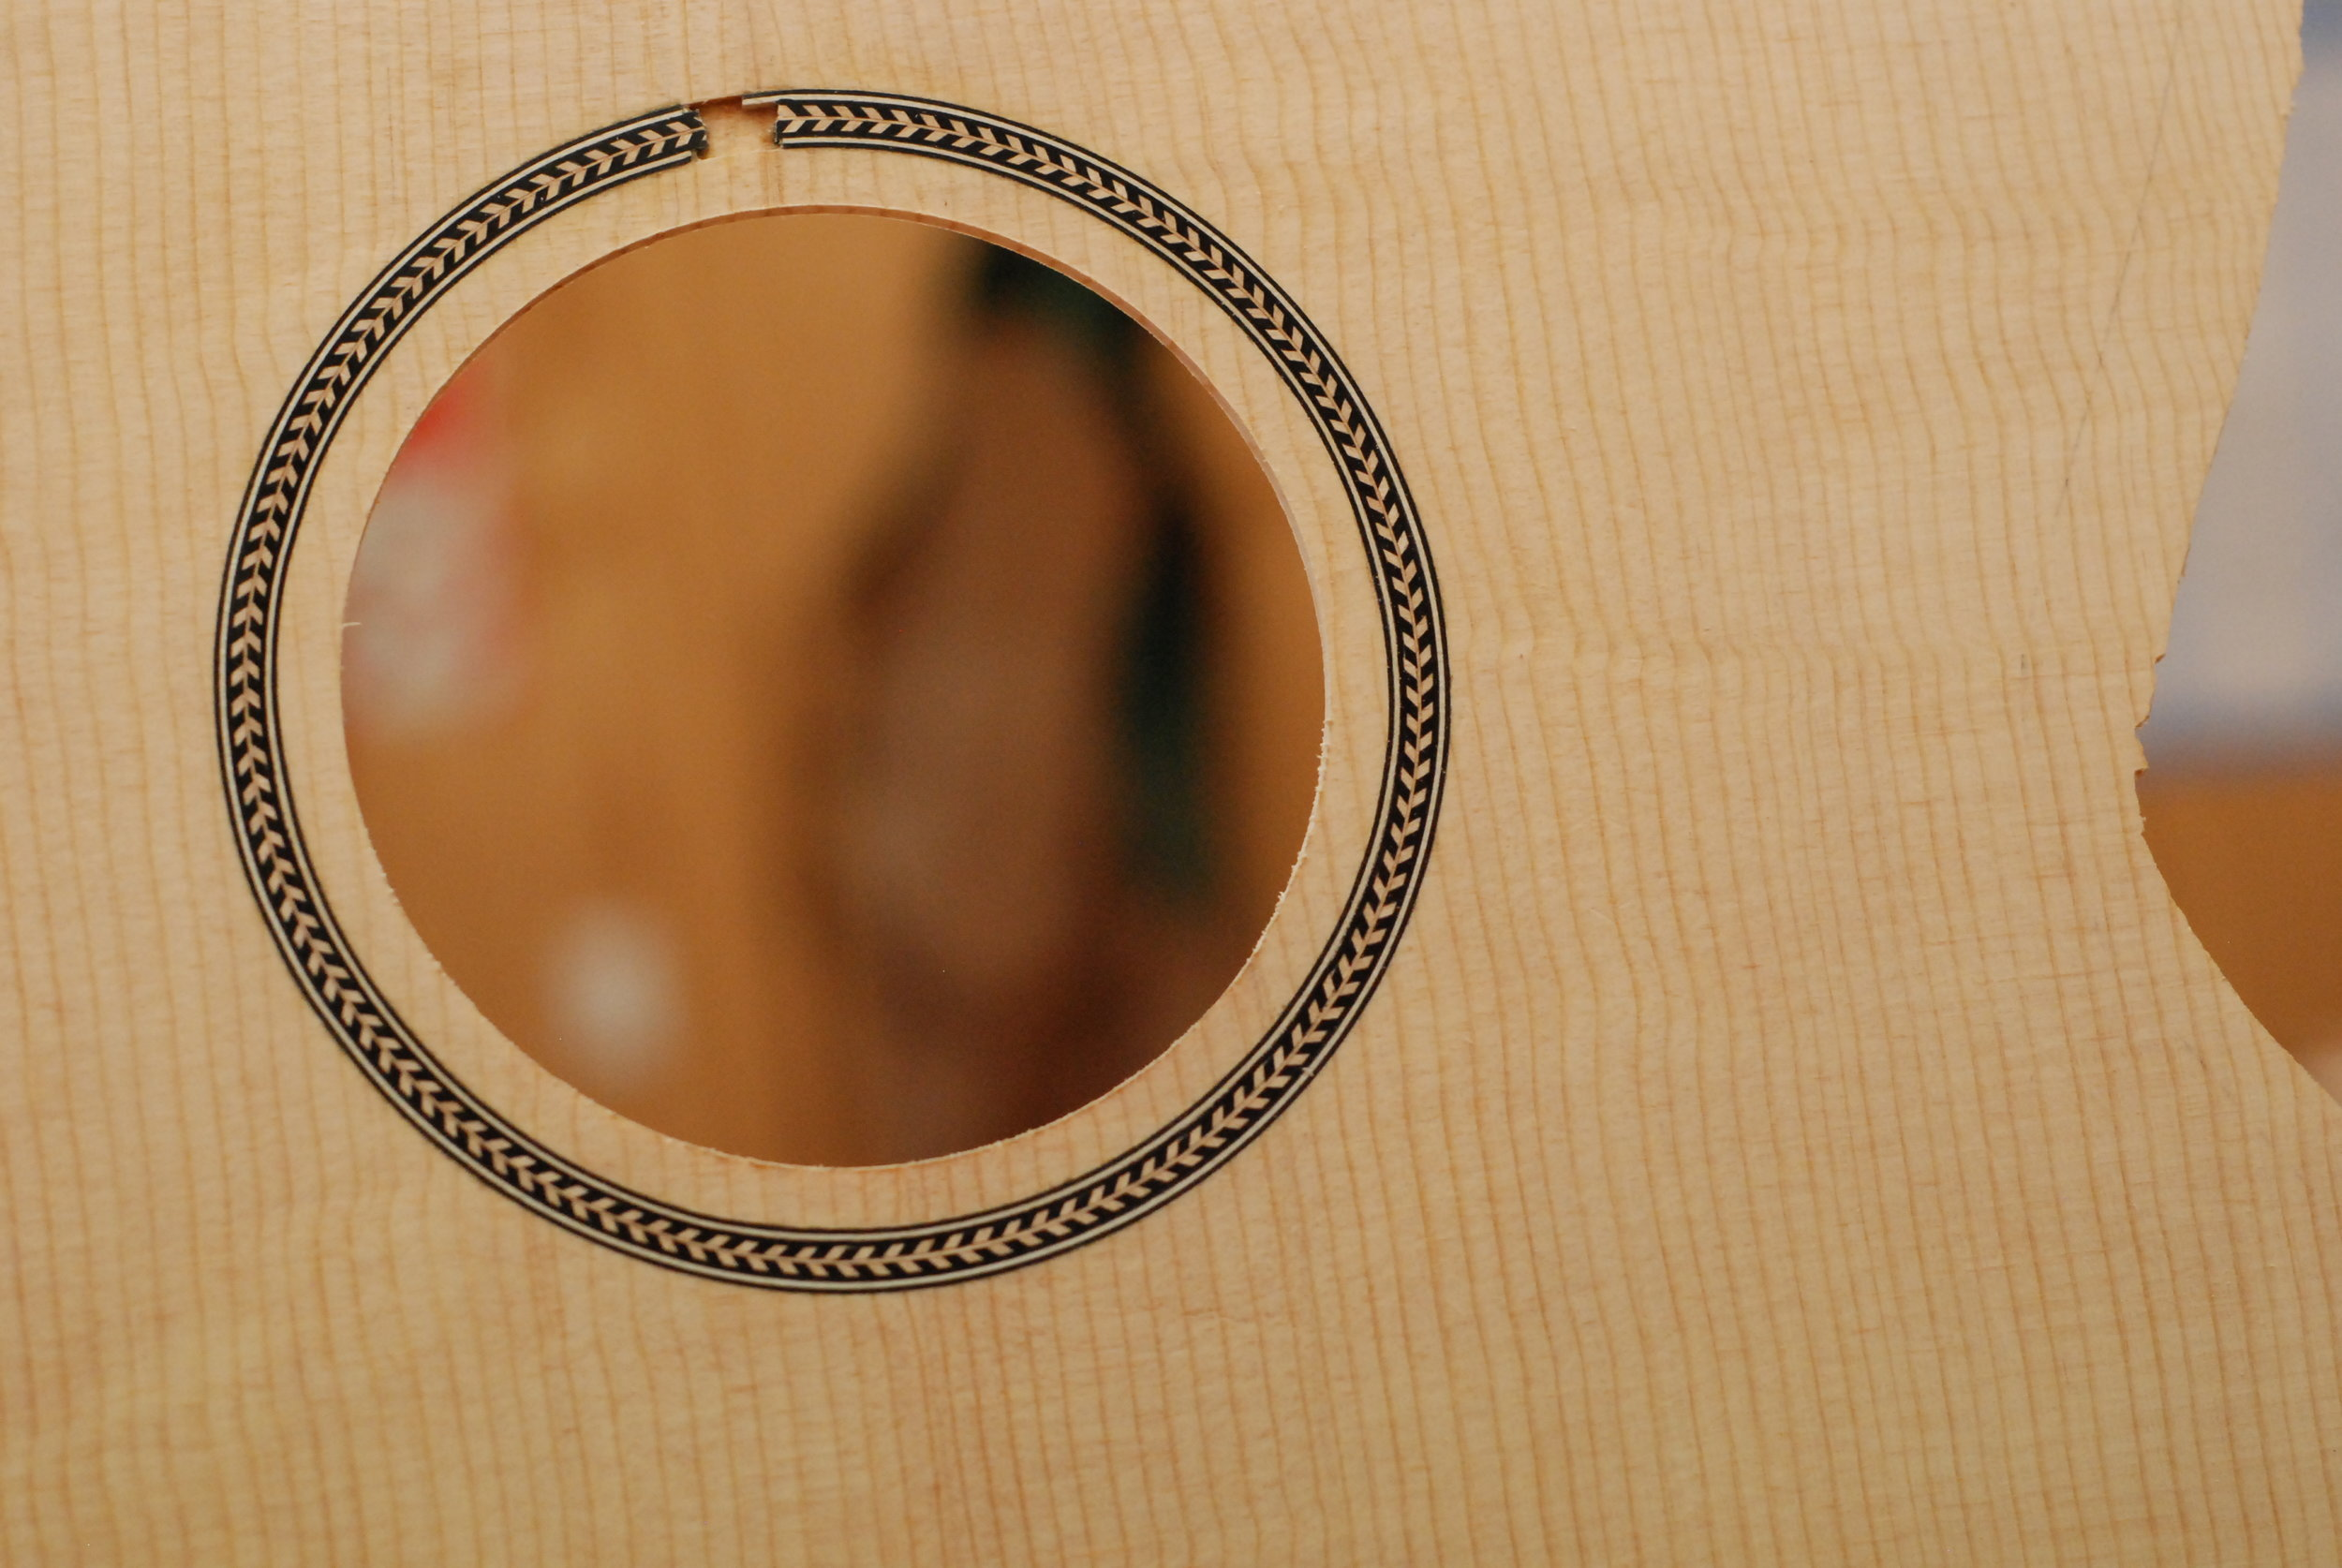 guitar_024.JPG